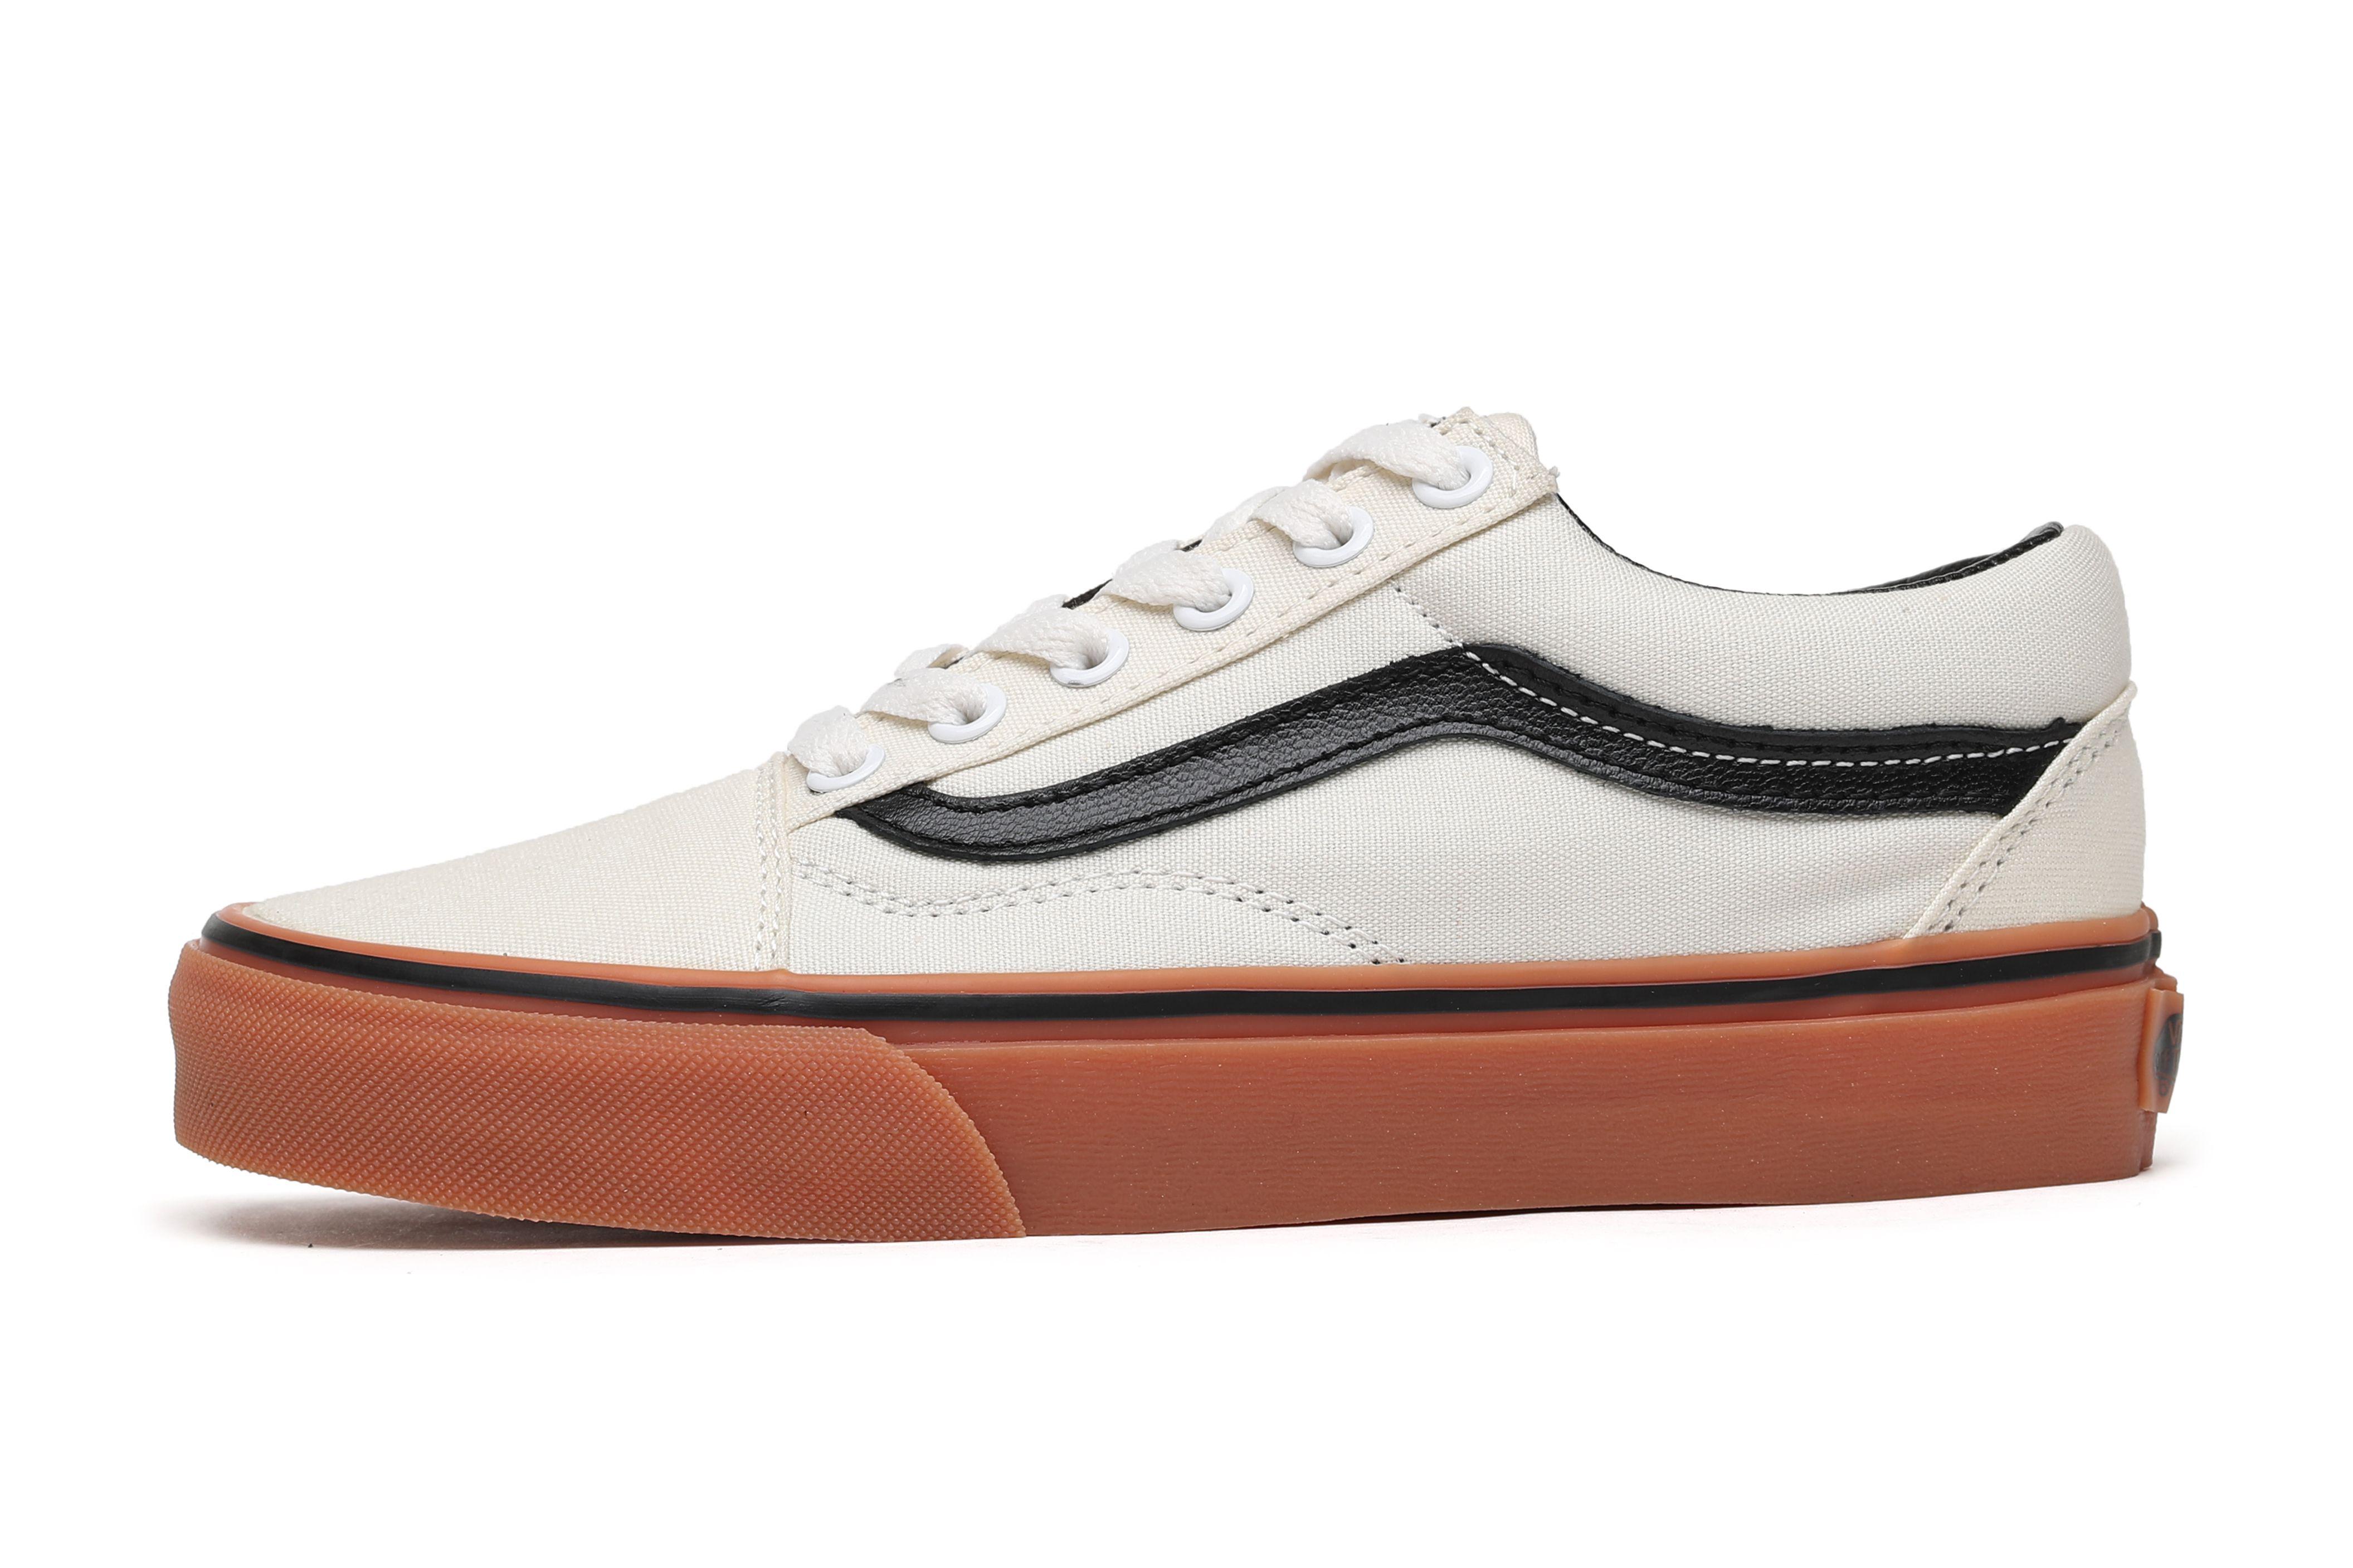 Vans Old Skool White VNOOO1G16 Skate Shoe For Sale #Vans